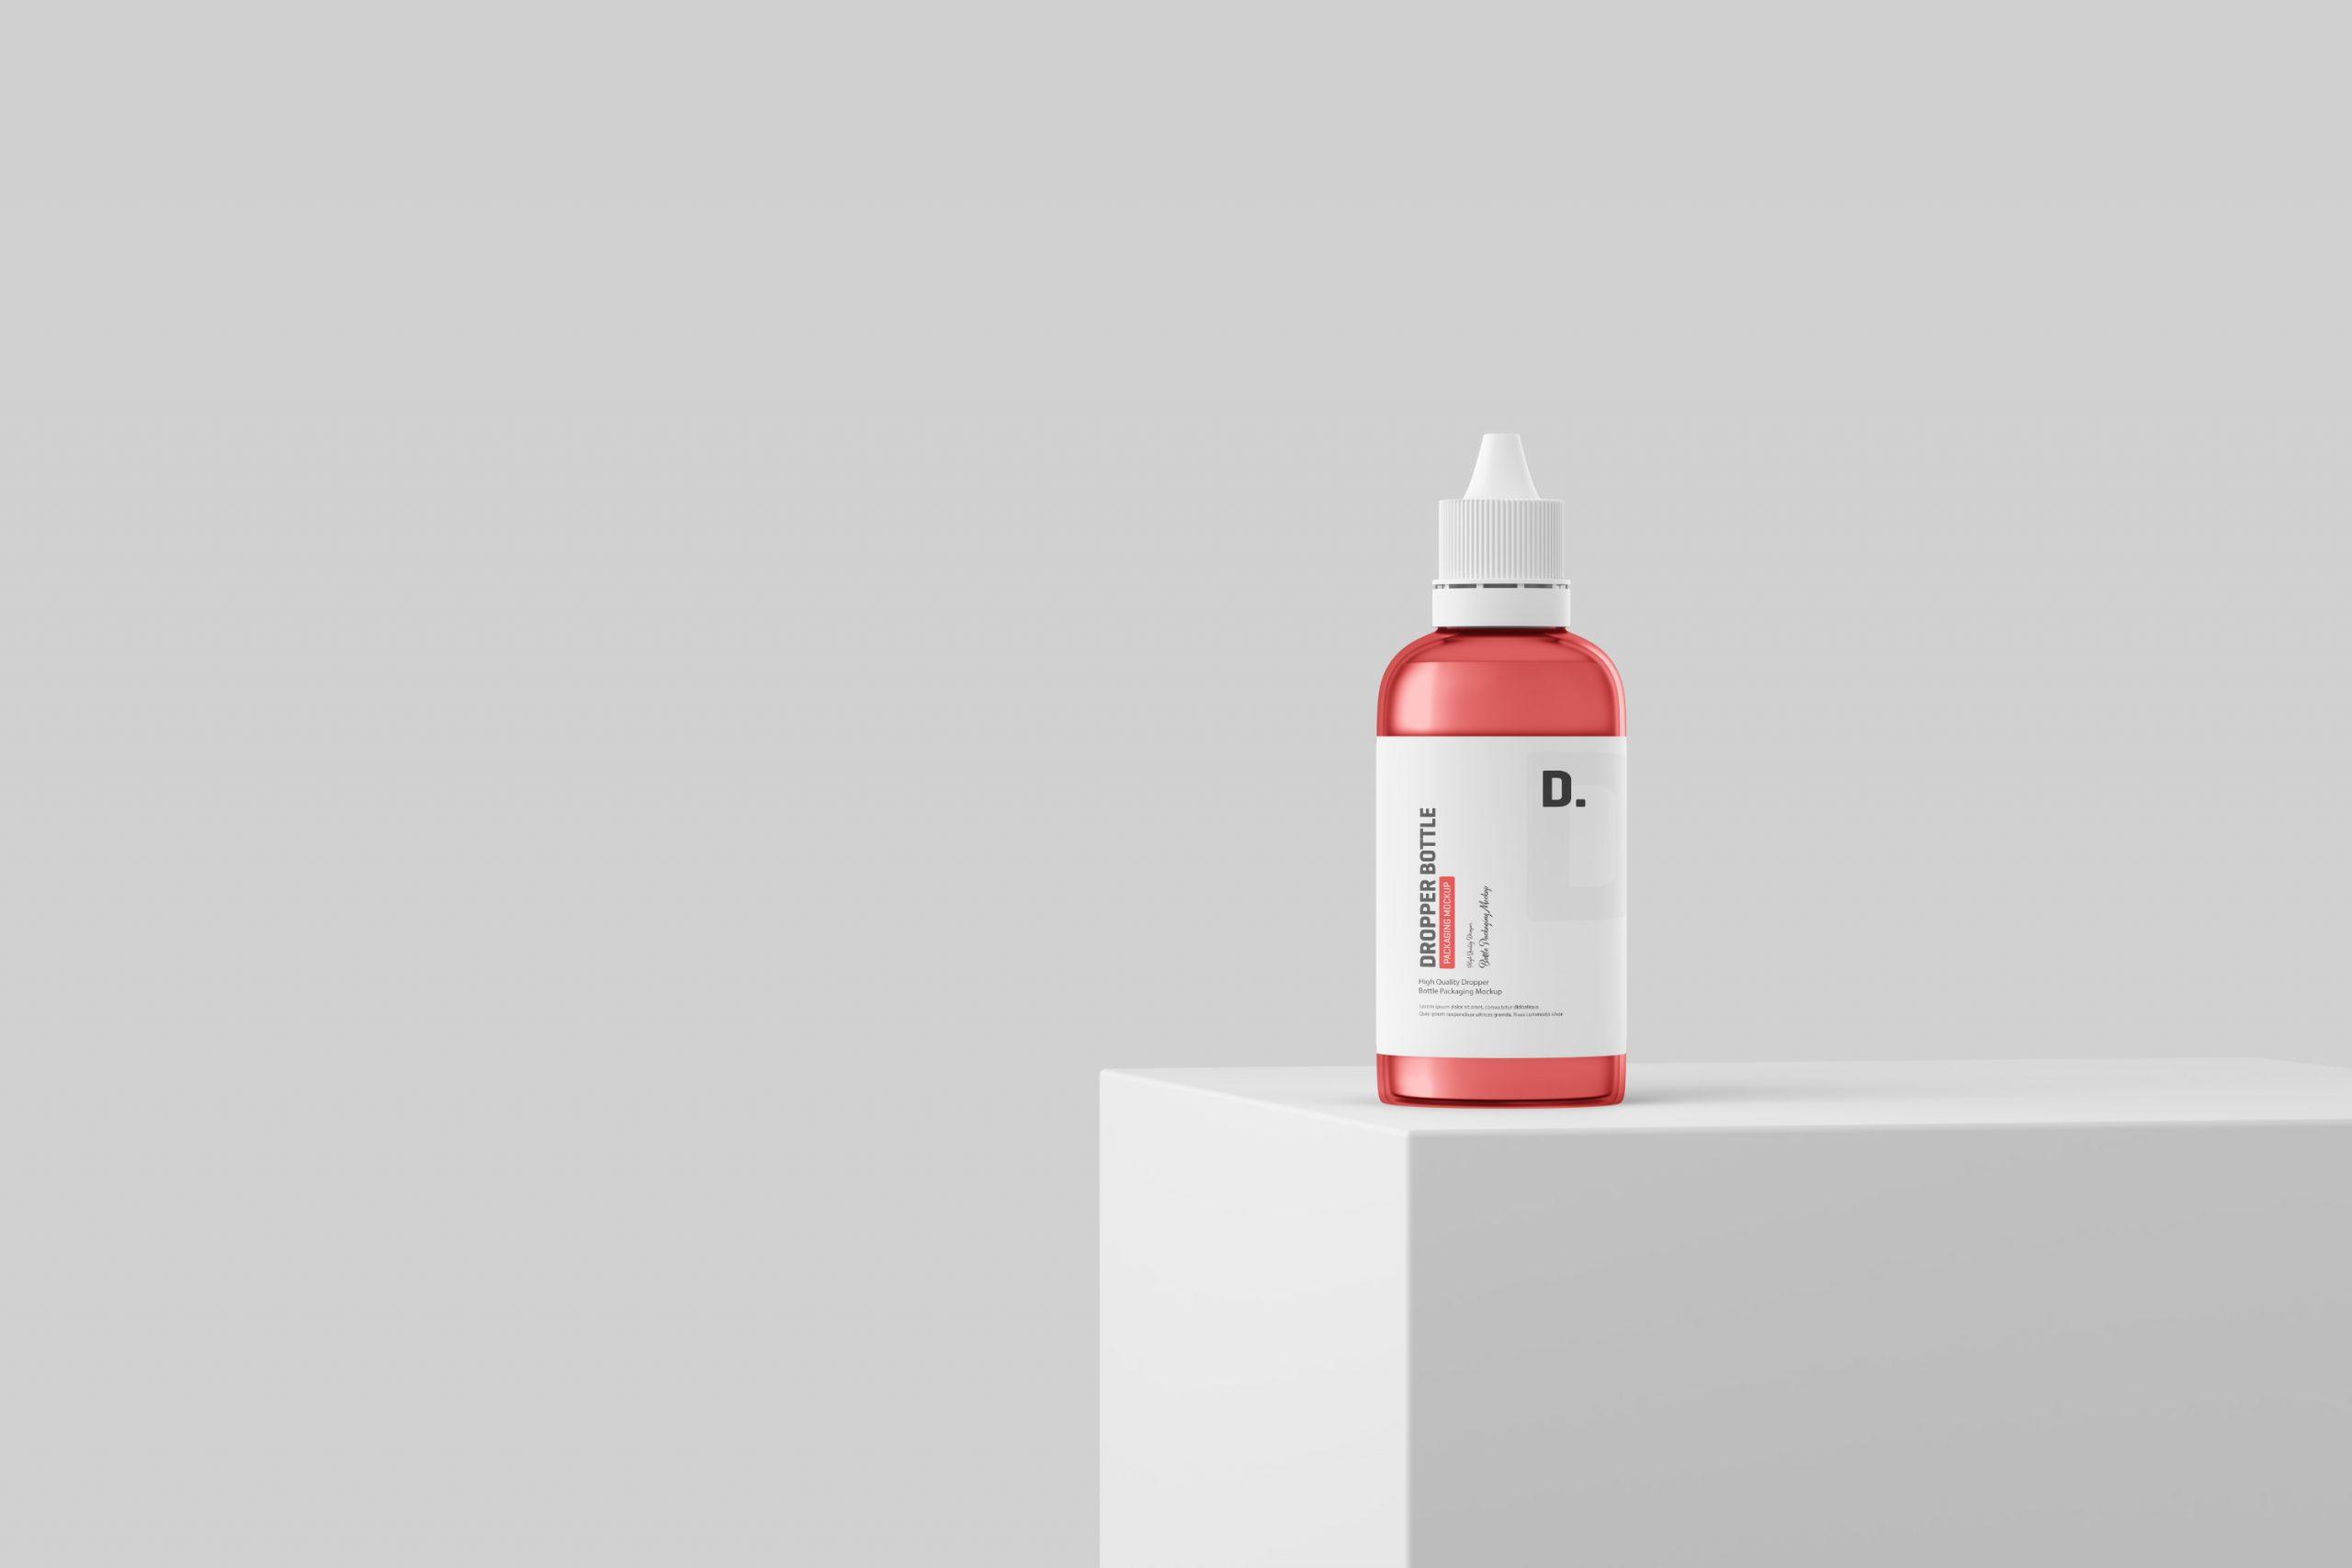 Dropper Bottle Packaging Mockup